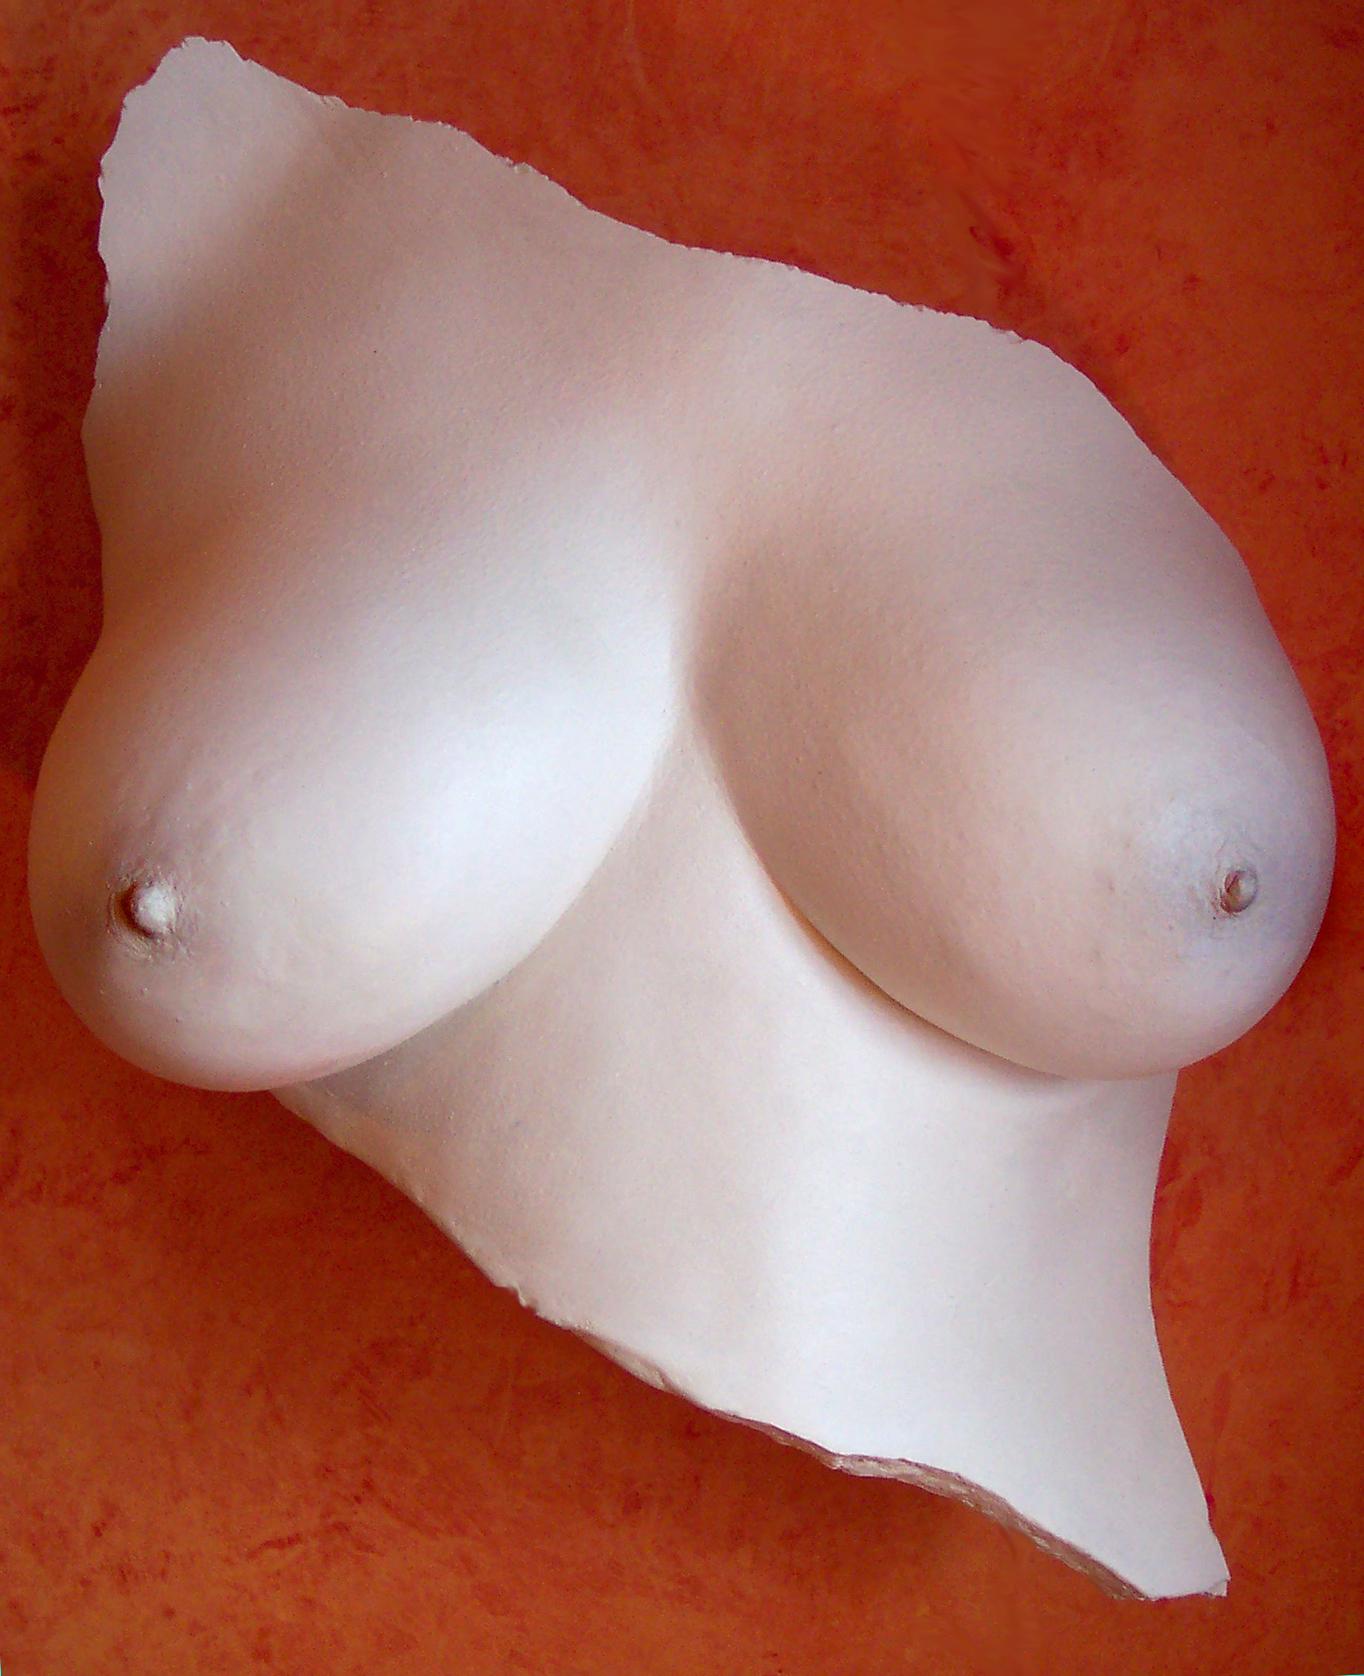 plain breasts 2 copy.jpg